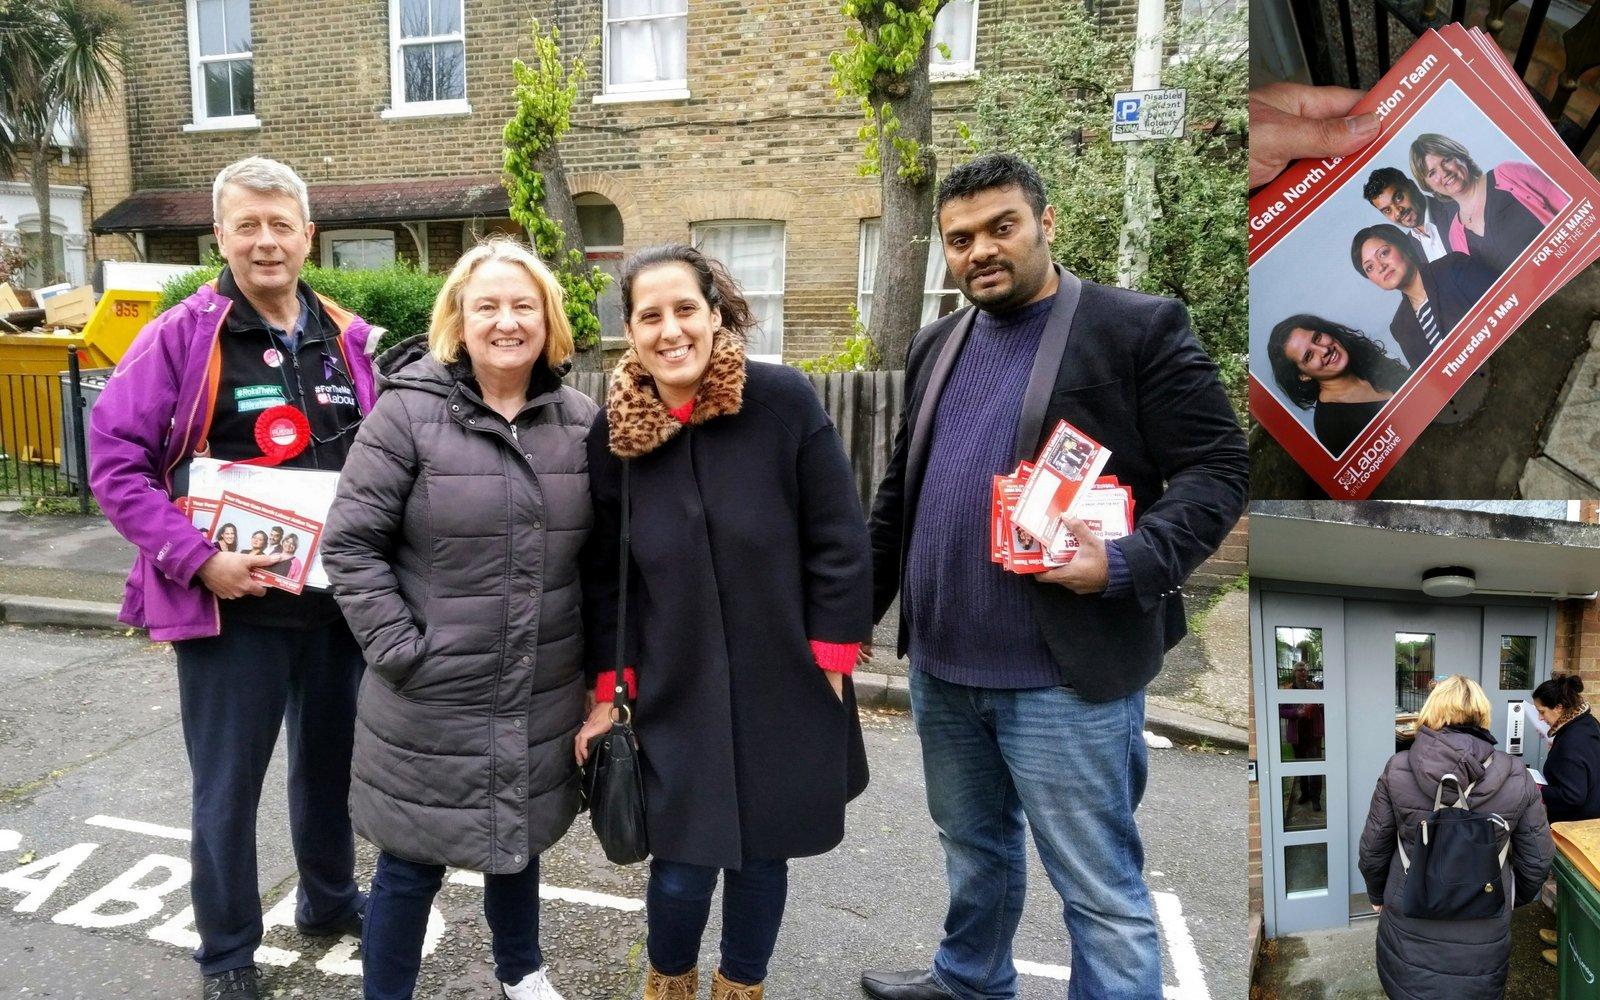 John's Labour blog: Foxes, UKIP Switchers & New Eastenders